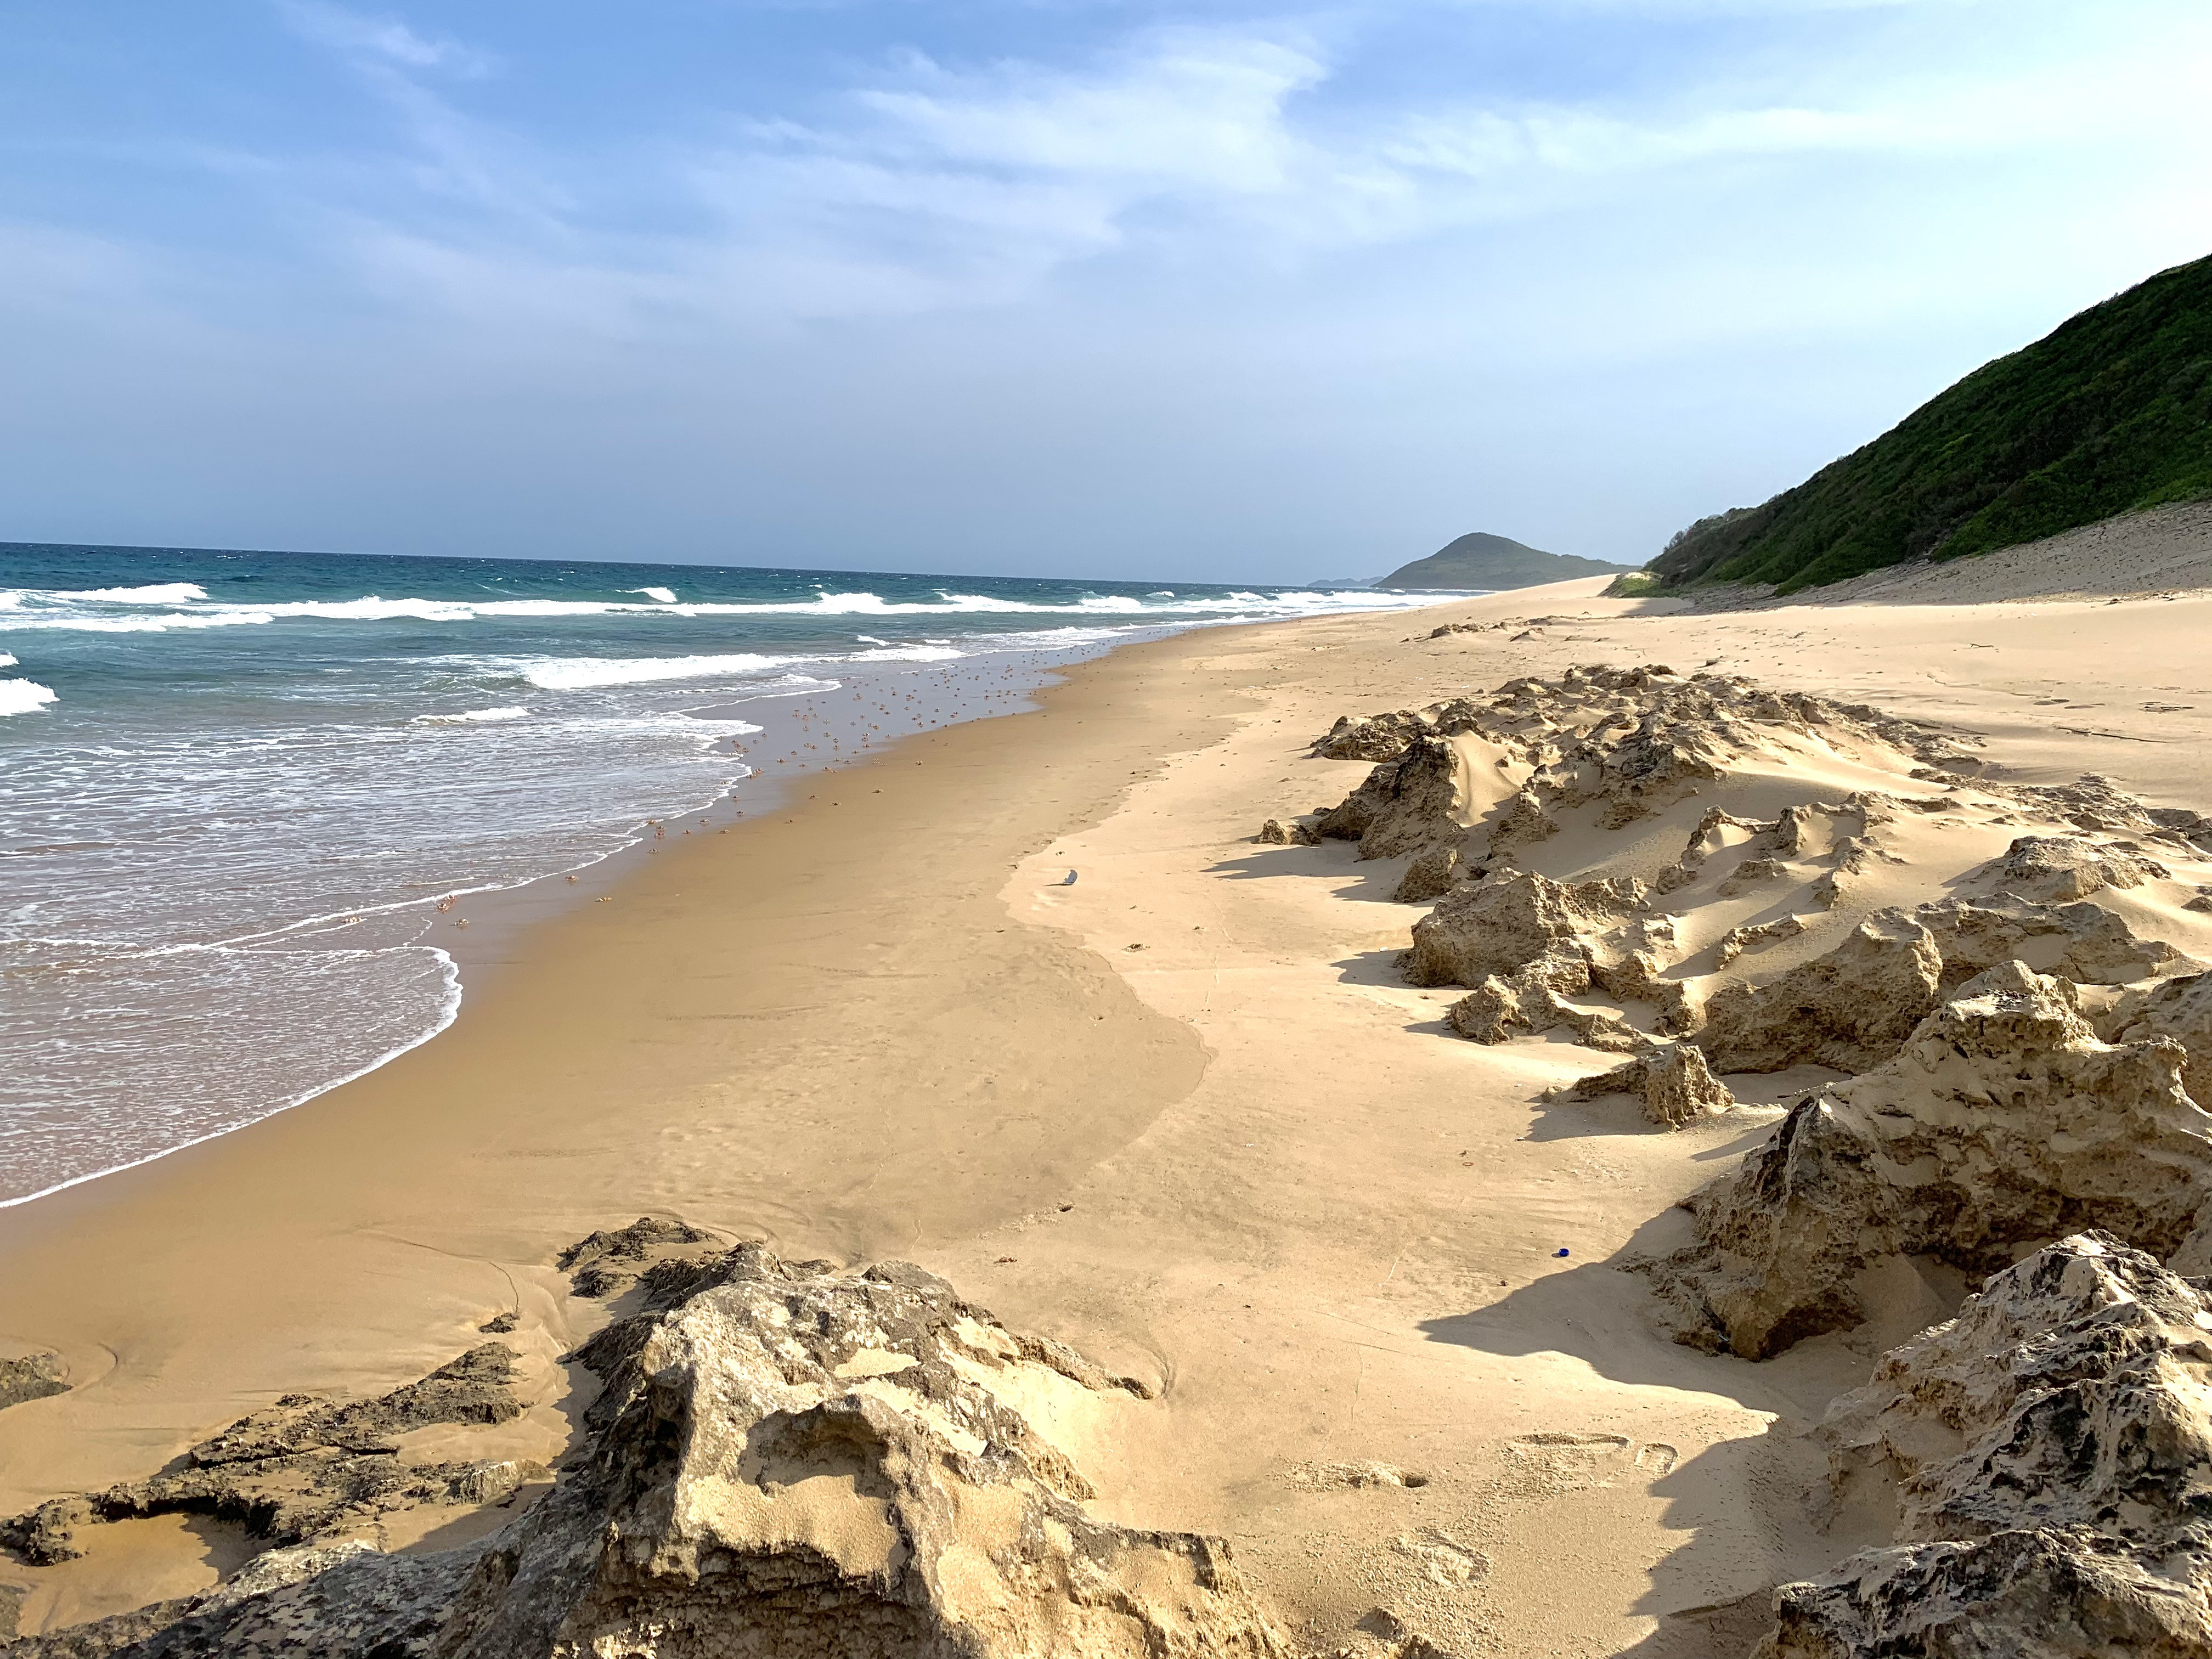 White Pearl Resorts beach image, White Pearl Resorts, Ponta Mamoli, Matutuine, Mozambique